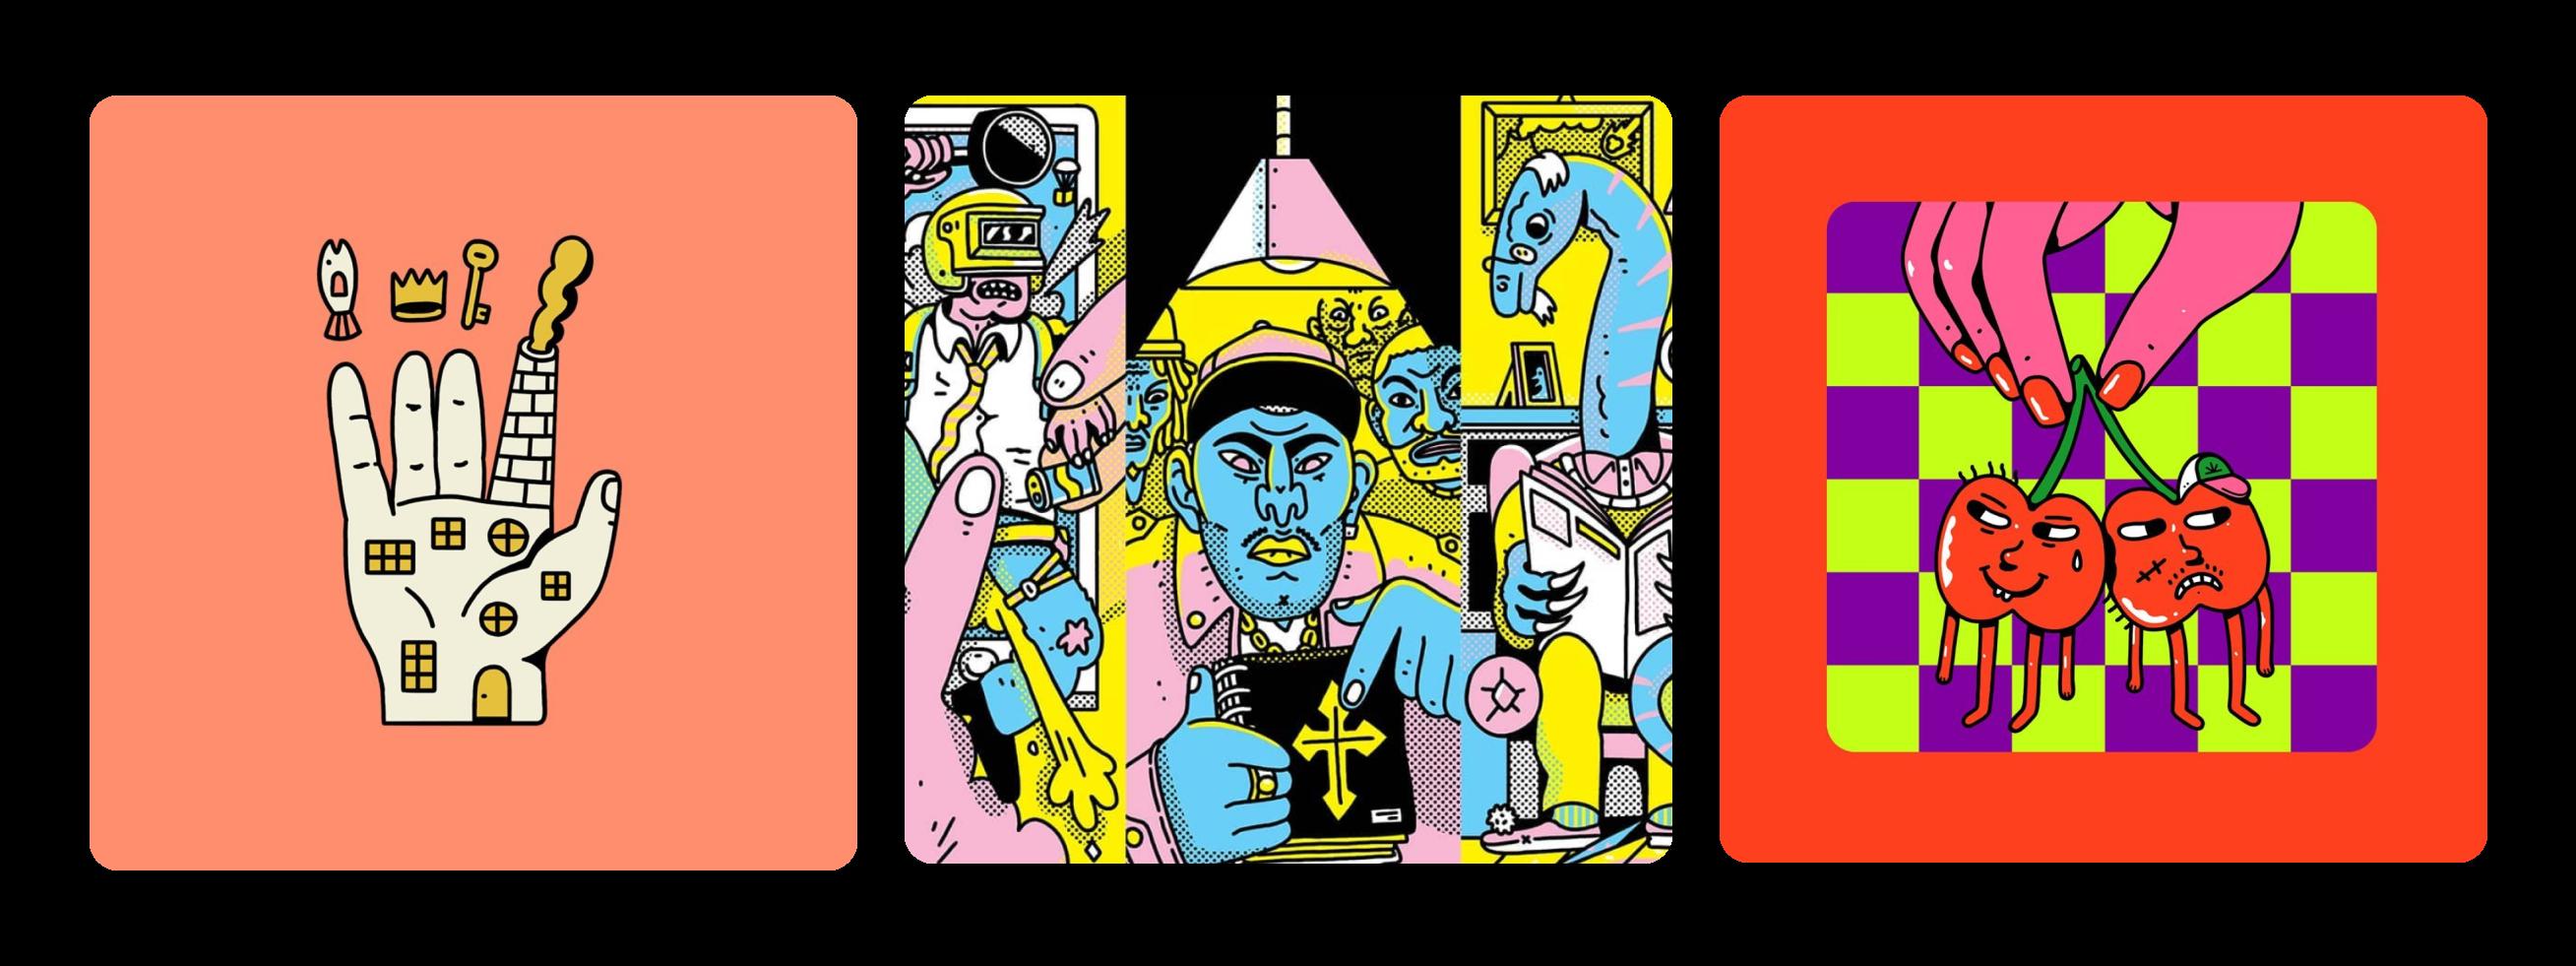 Psychedelic illustrations by Cezar Berje